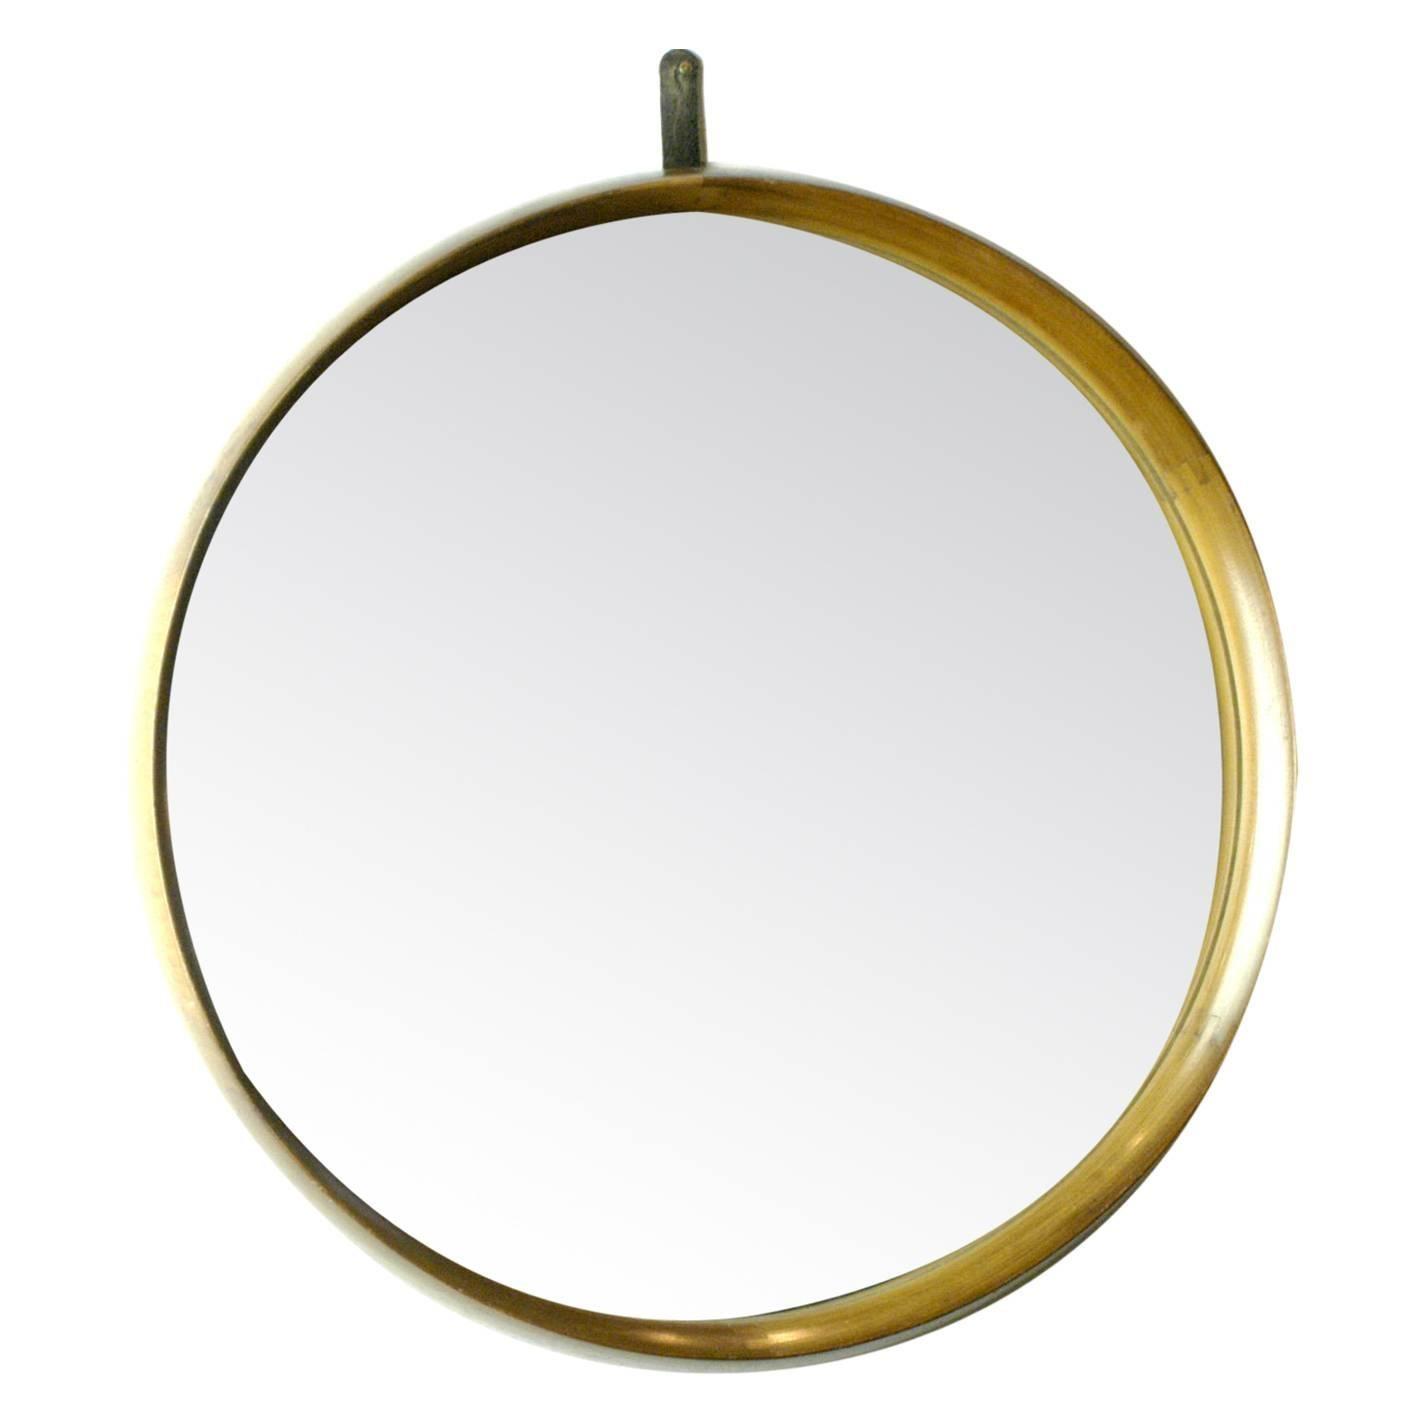 Scandinavian Circular Teak and Leather Wall Mirror